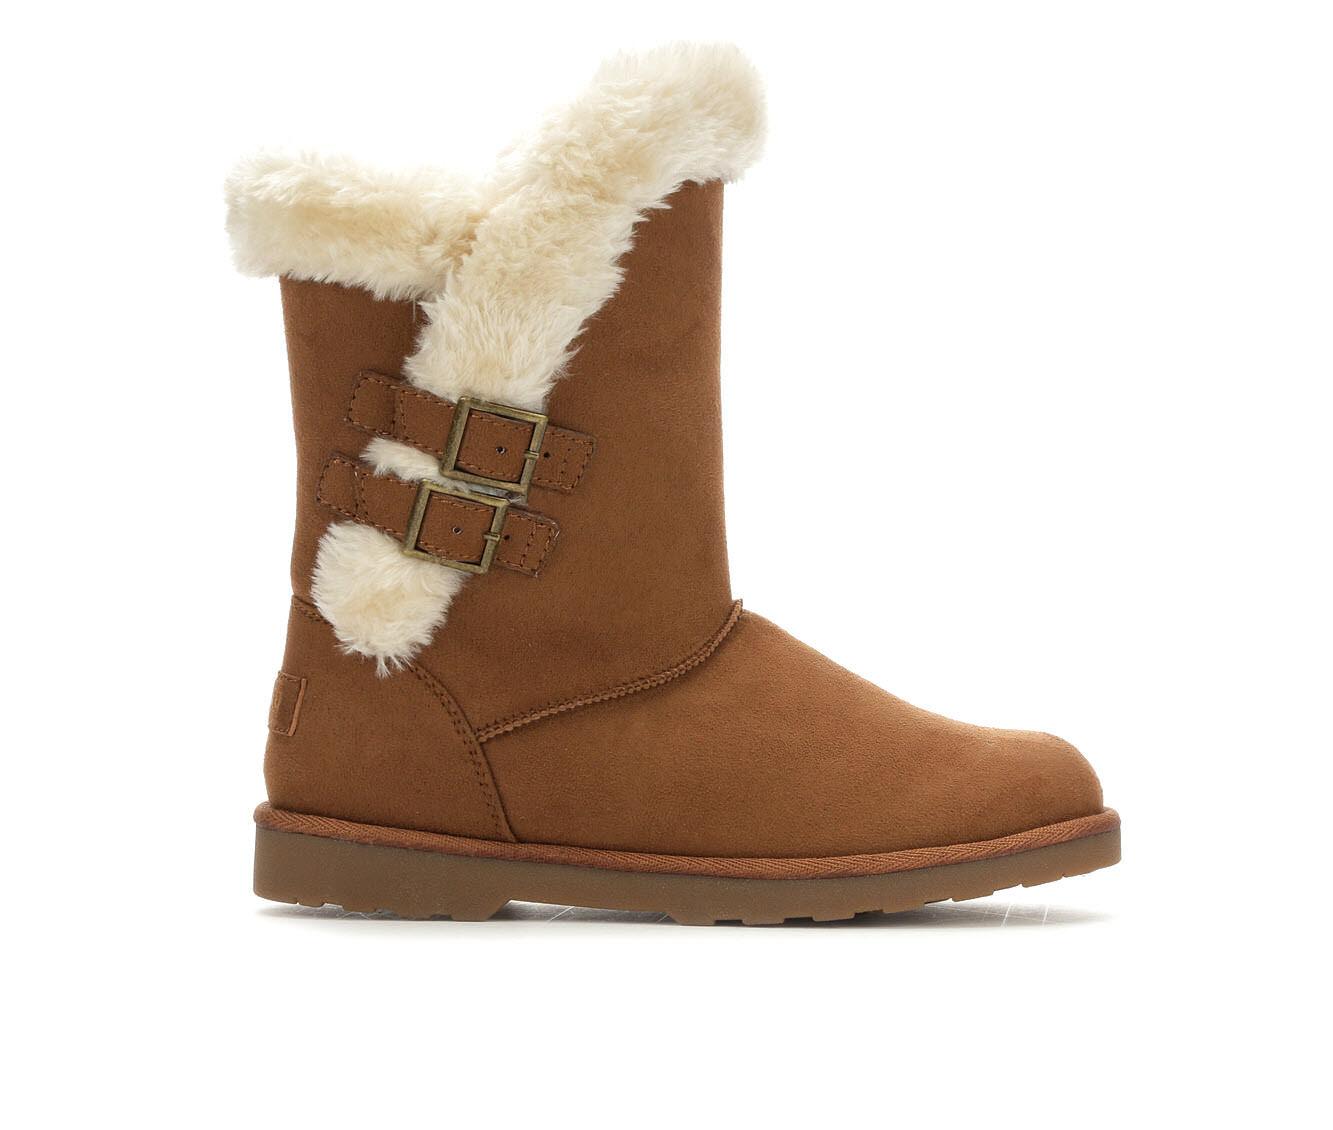 Makalu Gracia Winter Boots | Shoe Carnival